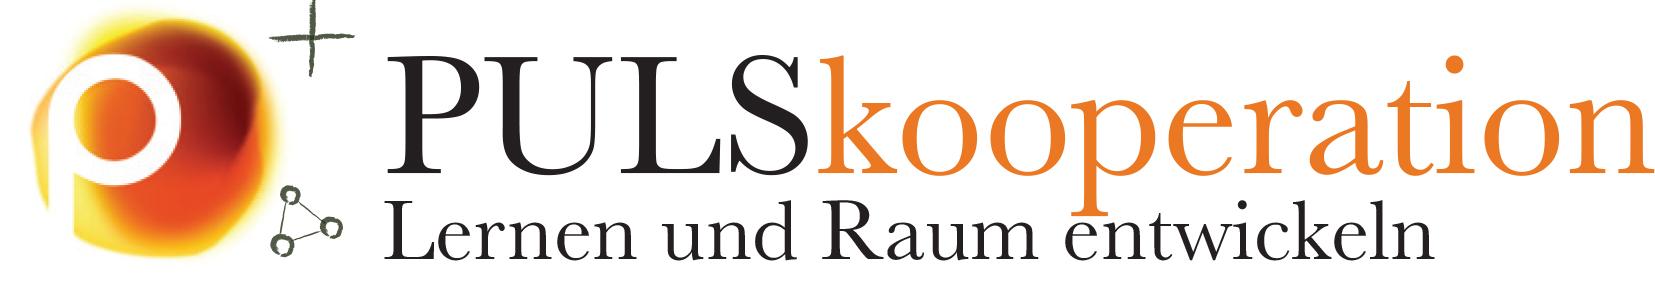 180418_Logo_k_var_2